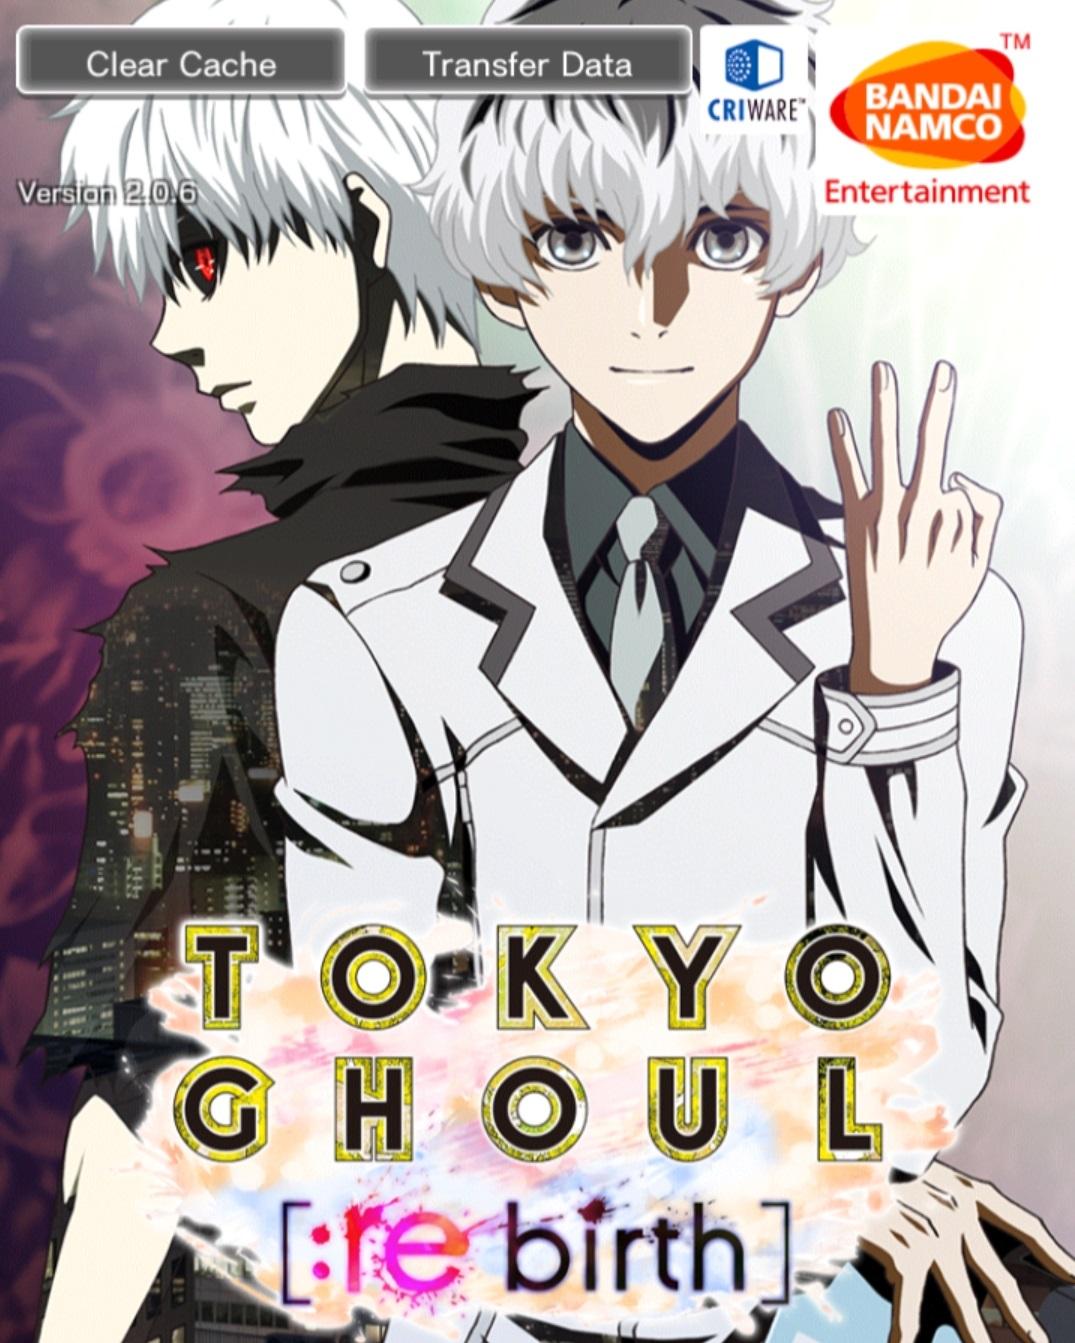 Mobage」 Tokyo Ghoul [:re birth] | Milkcananime